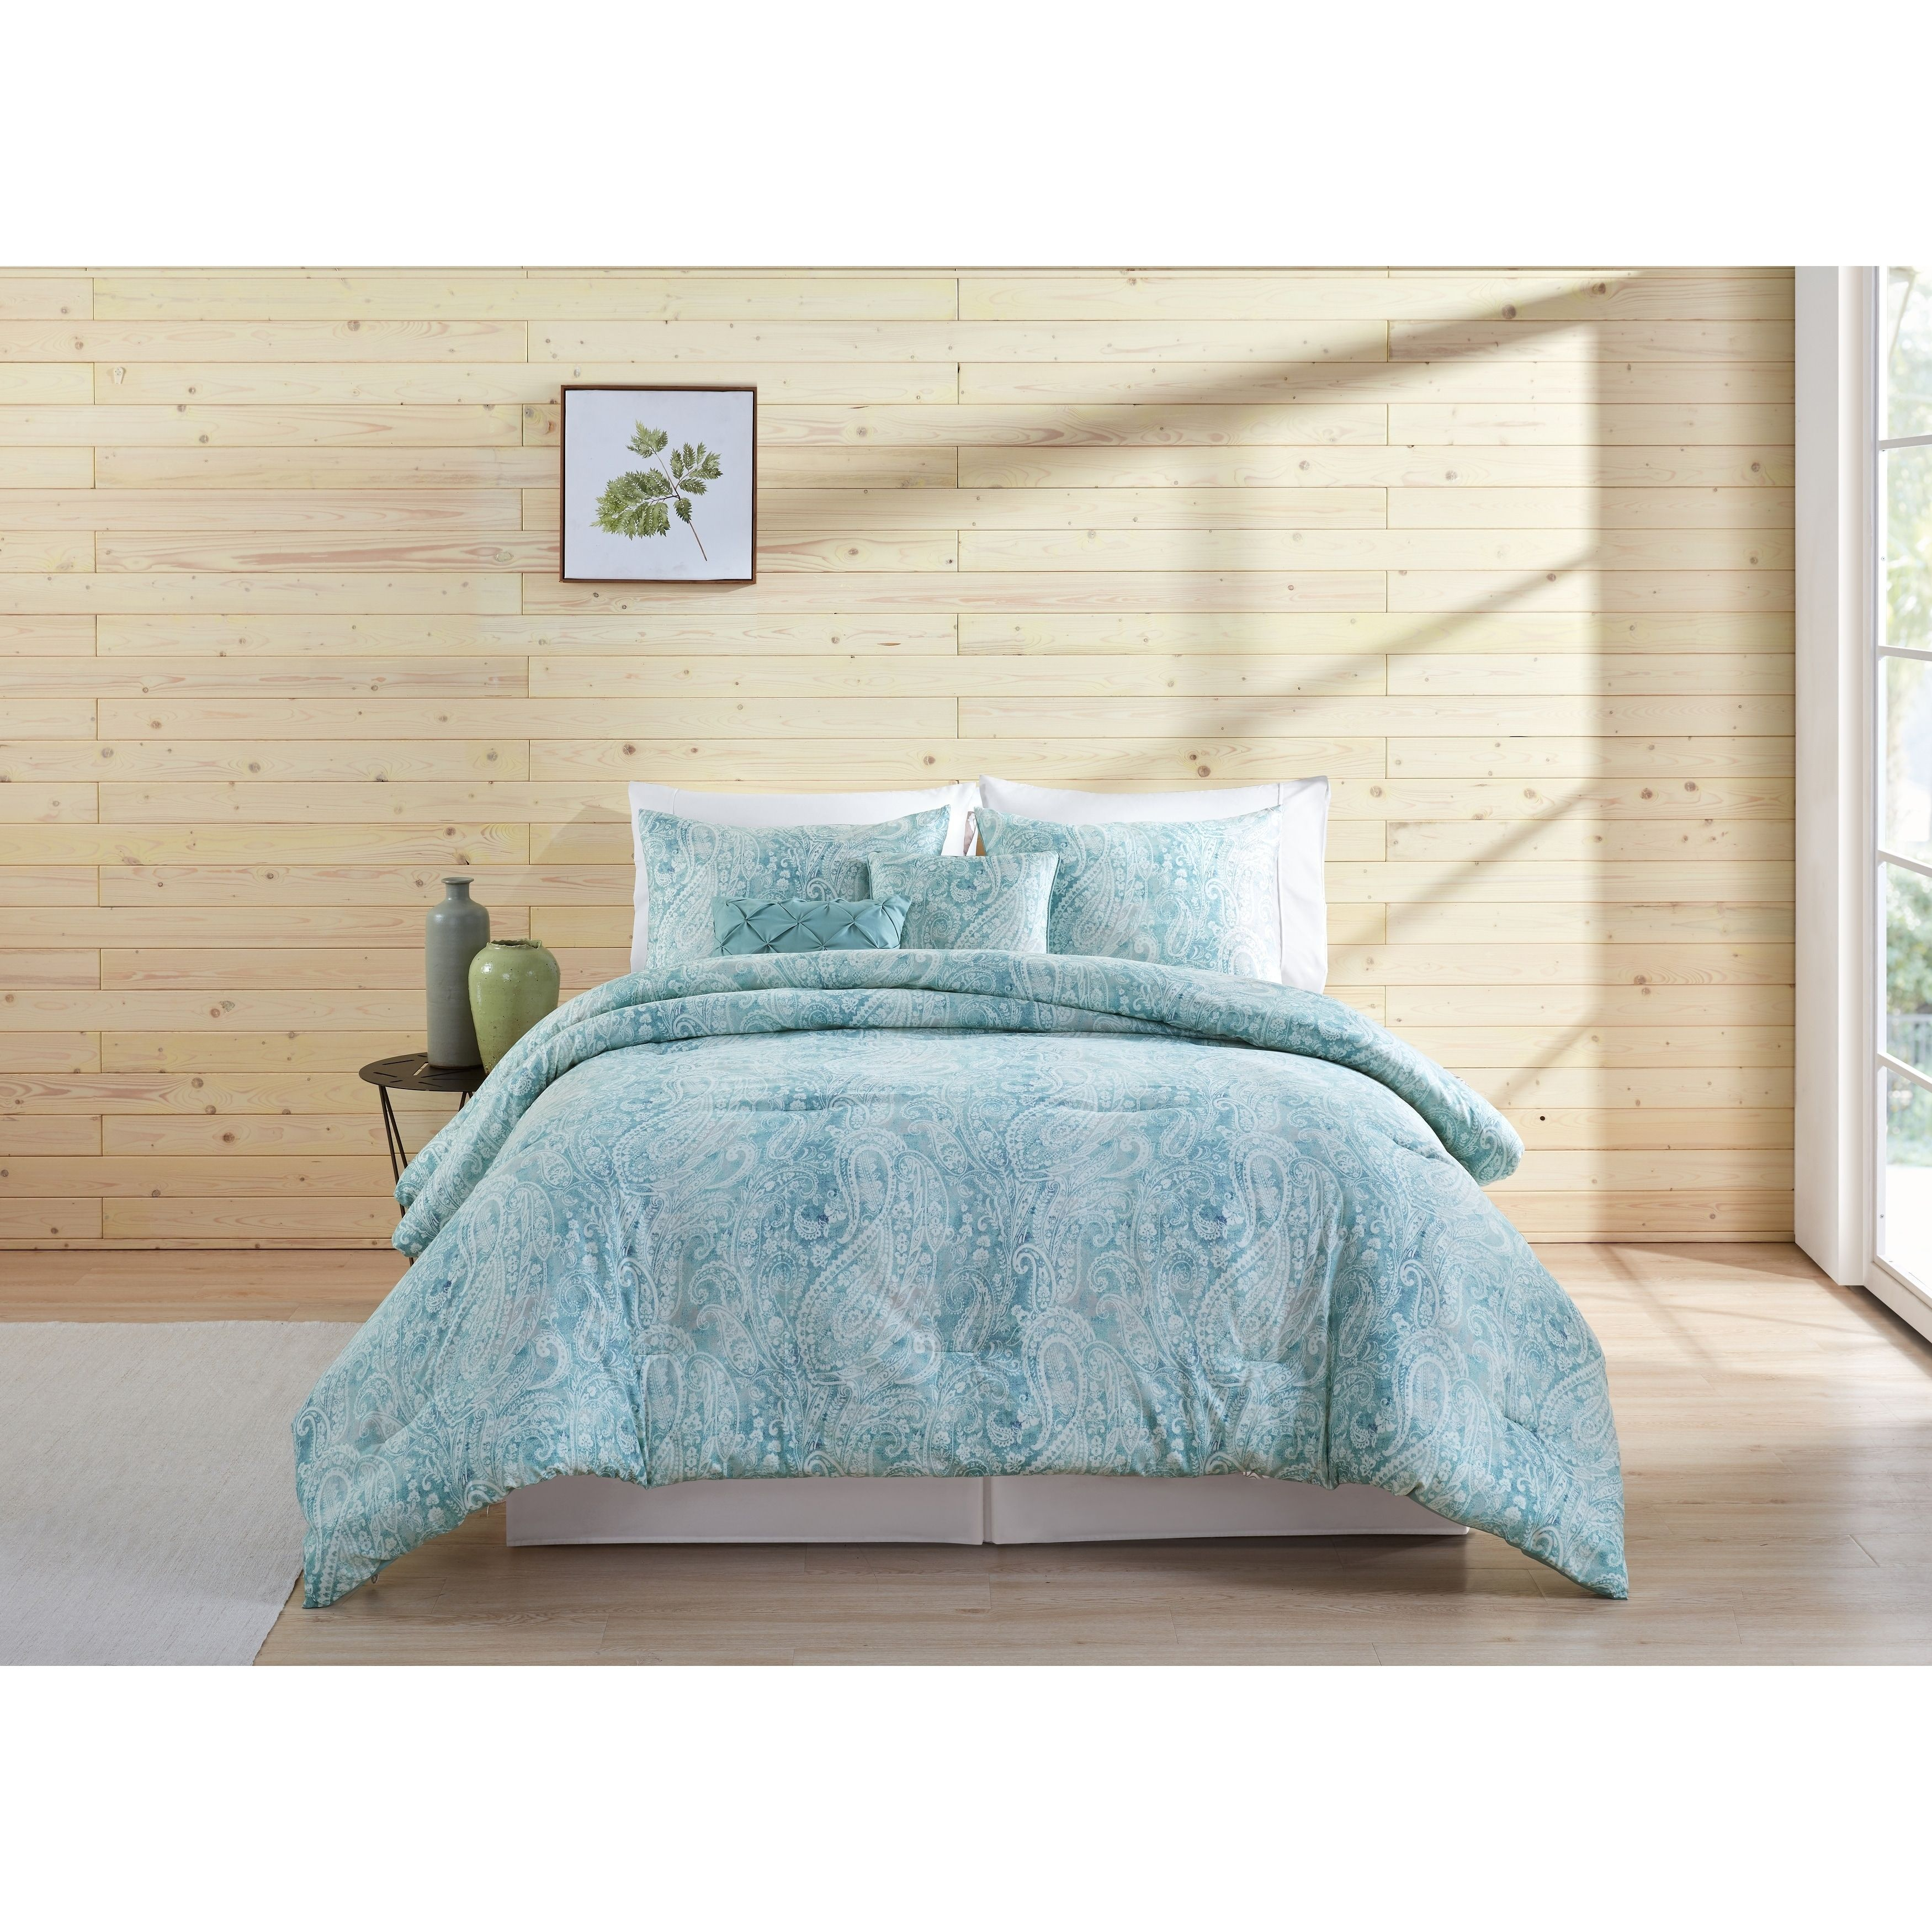 Vcny Home Keisha 5 Piece Comforter Set